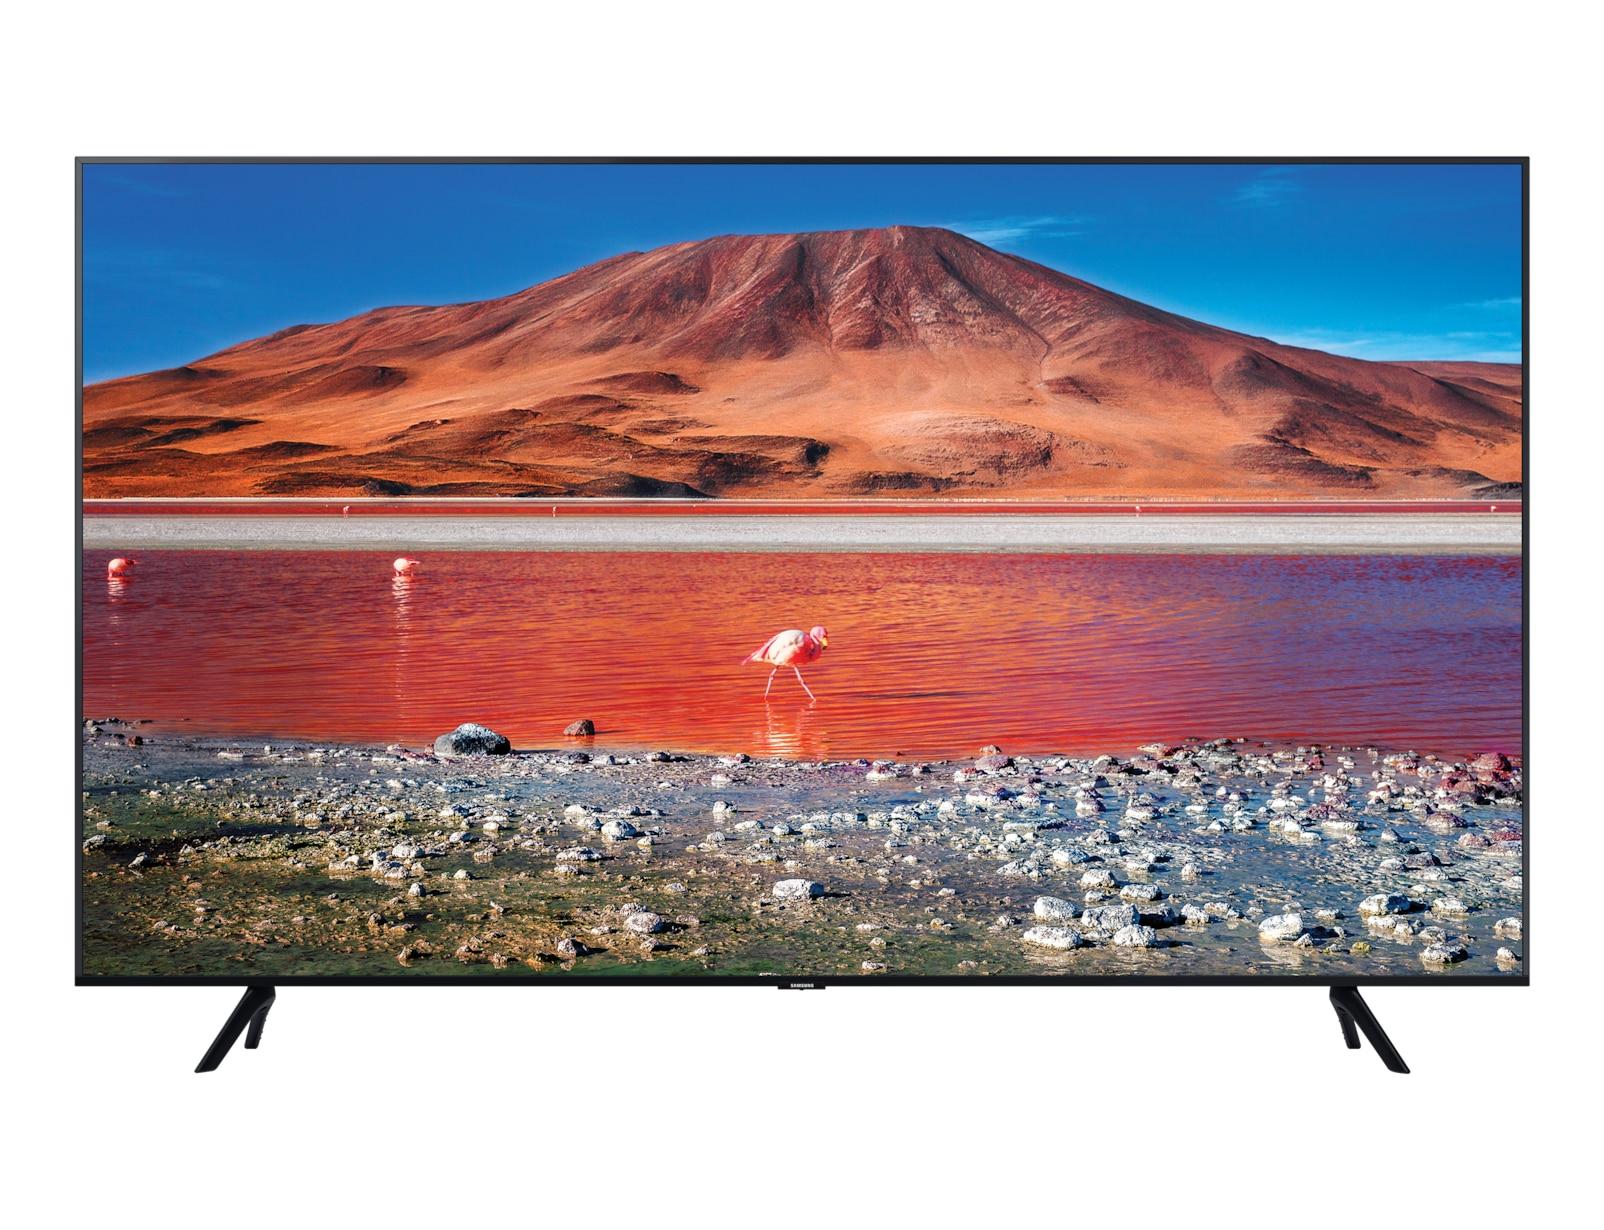 "Samsung Dimensioni schermo: 127 cm (50"") - Ue50tu7070uxzt"